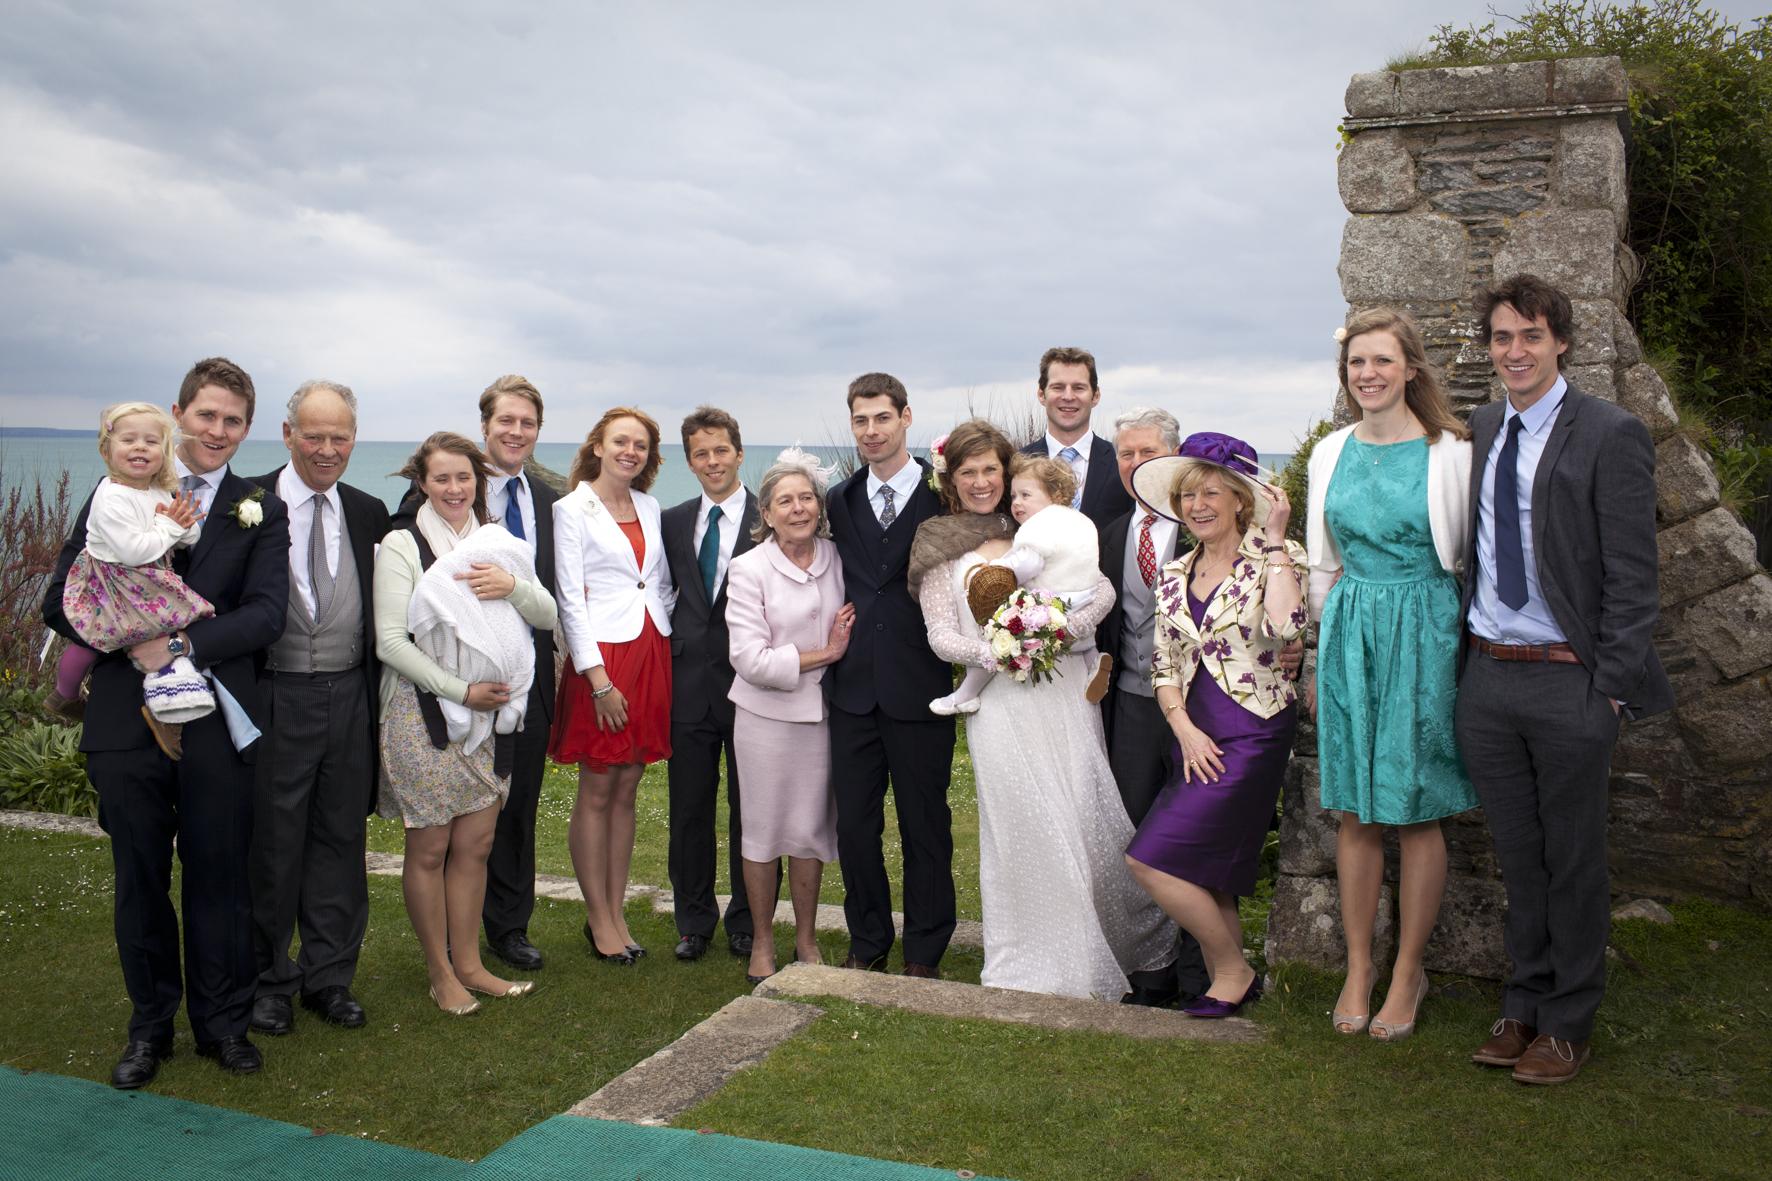 Wedding example_M&P__MG_3735_Claudia Leisinger.jpg